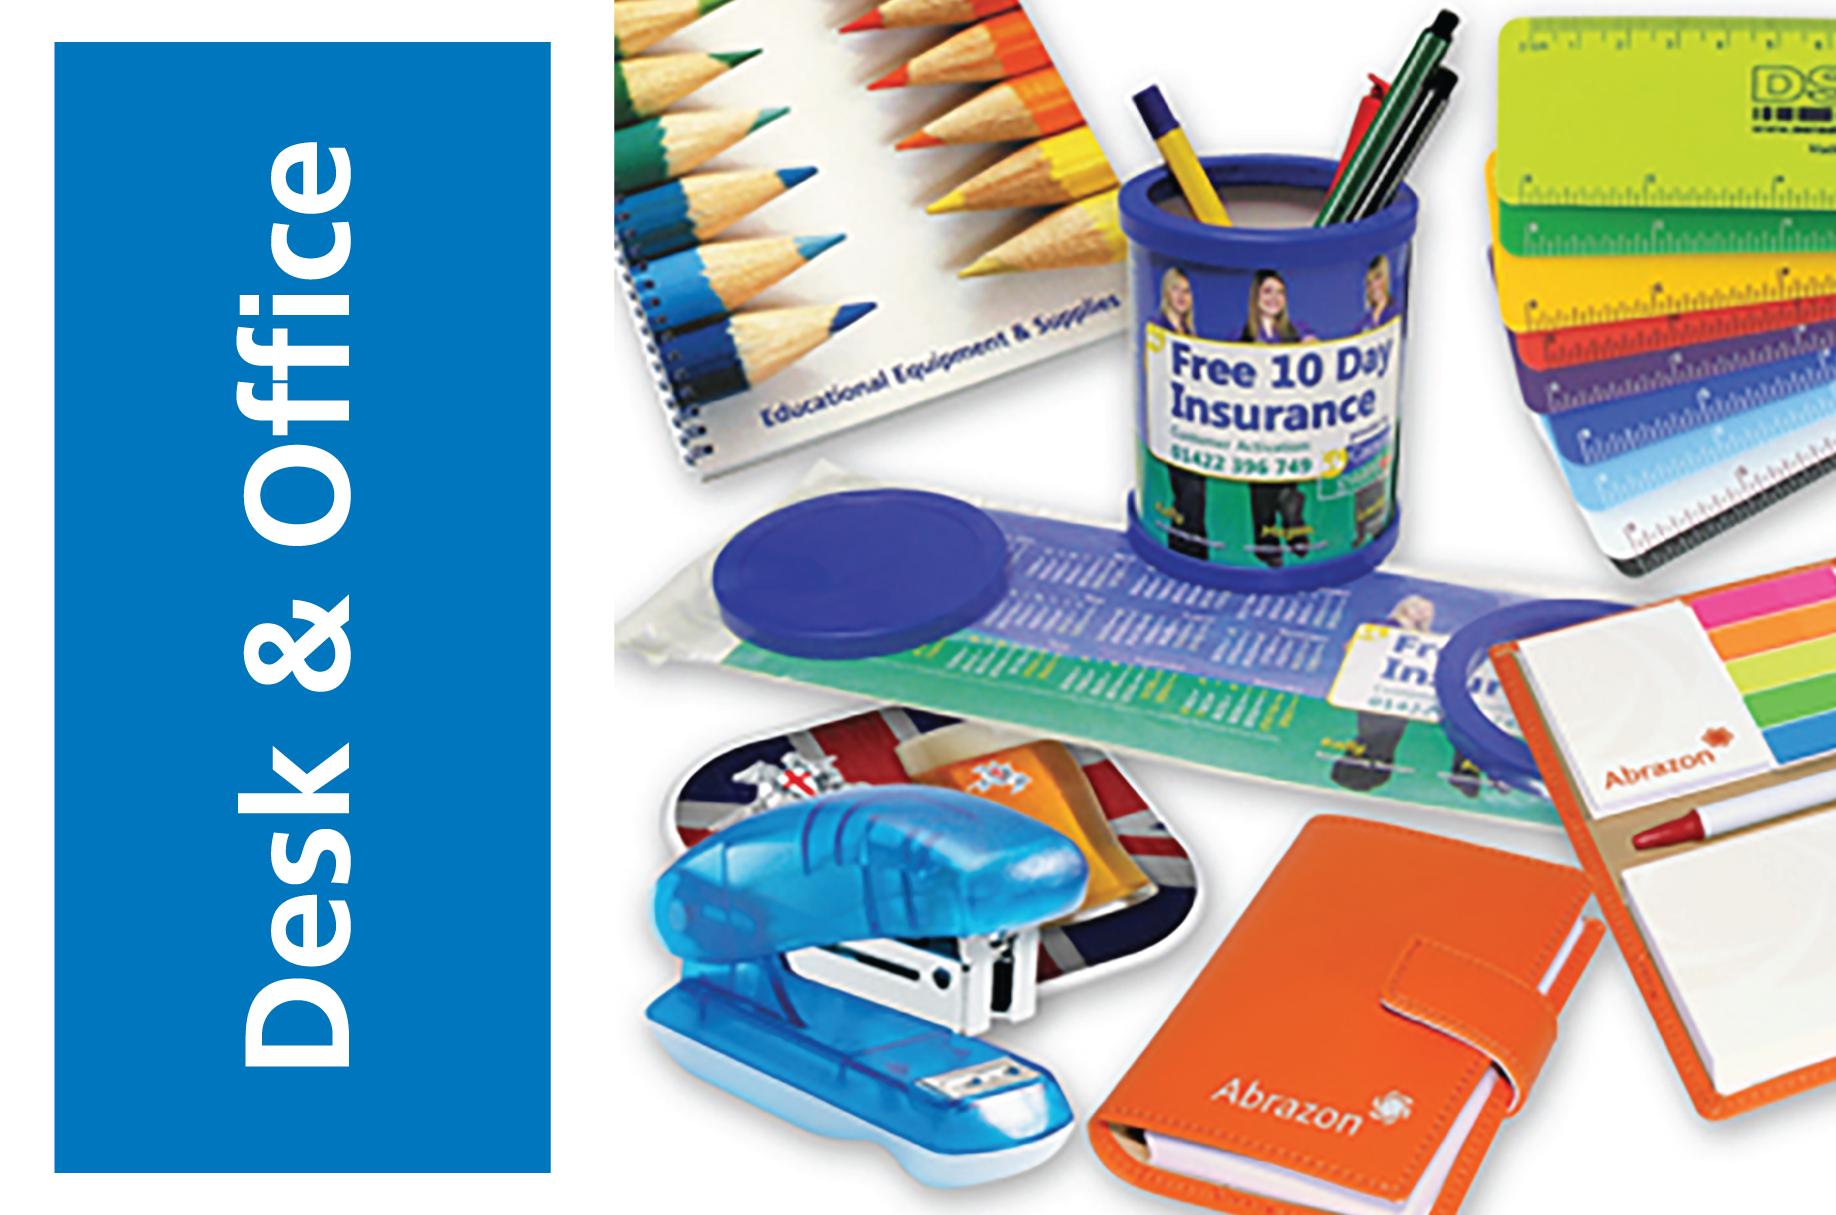 desk office branded office merchandise